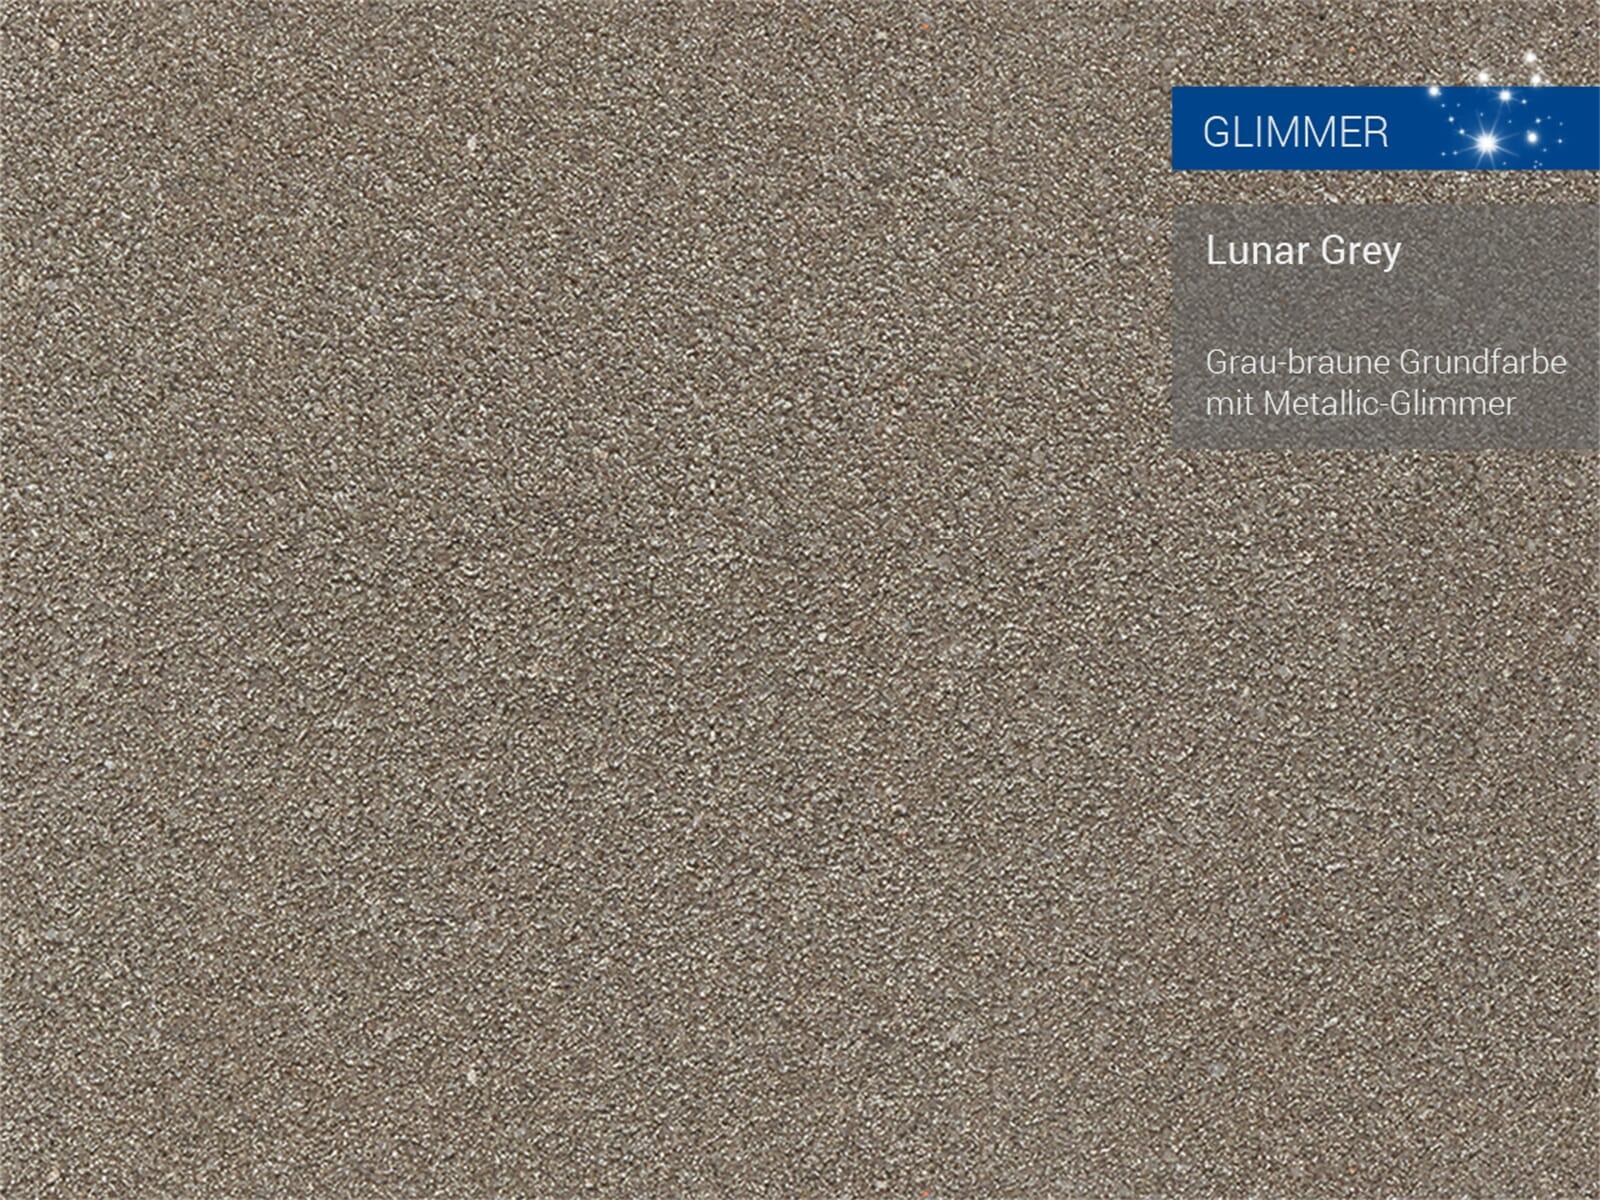 Franke Kubus 2 KNG 110-52 Lunar Grey - 11958 Granitspüle Exzenterbetätigung